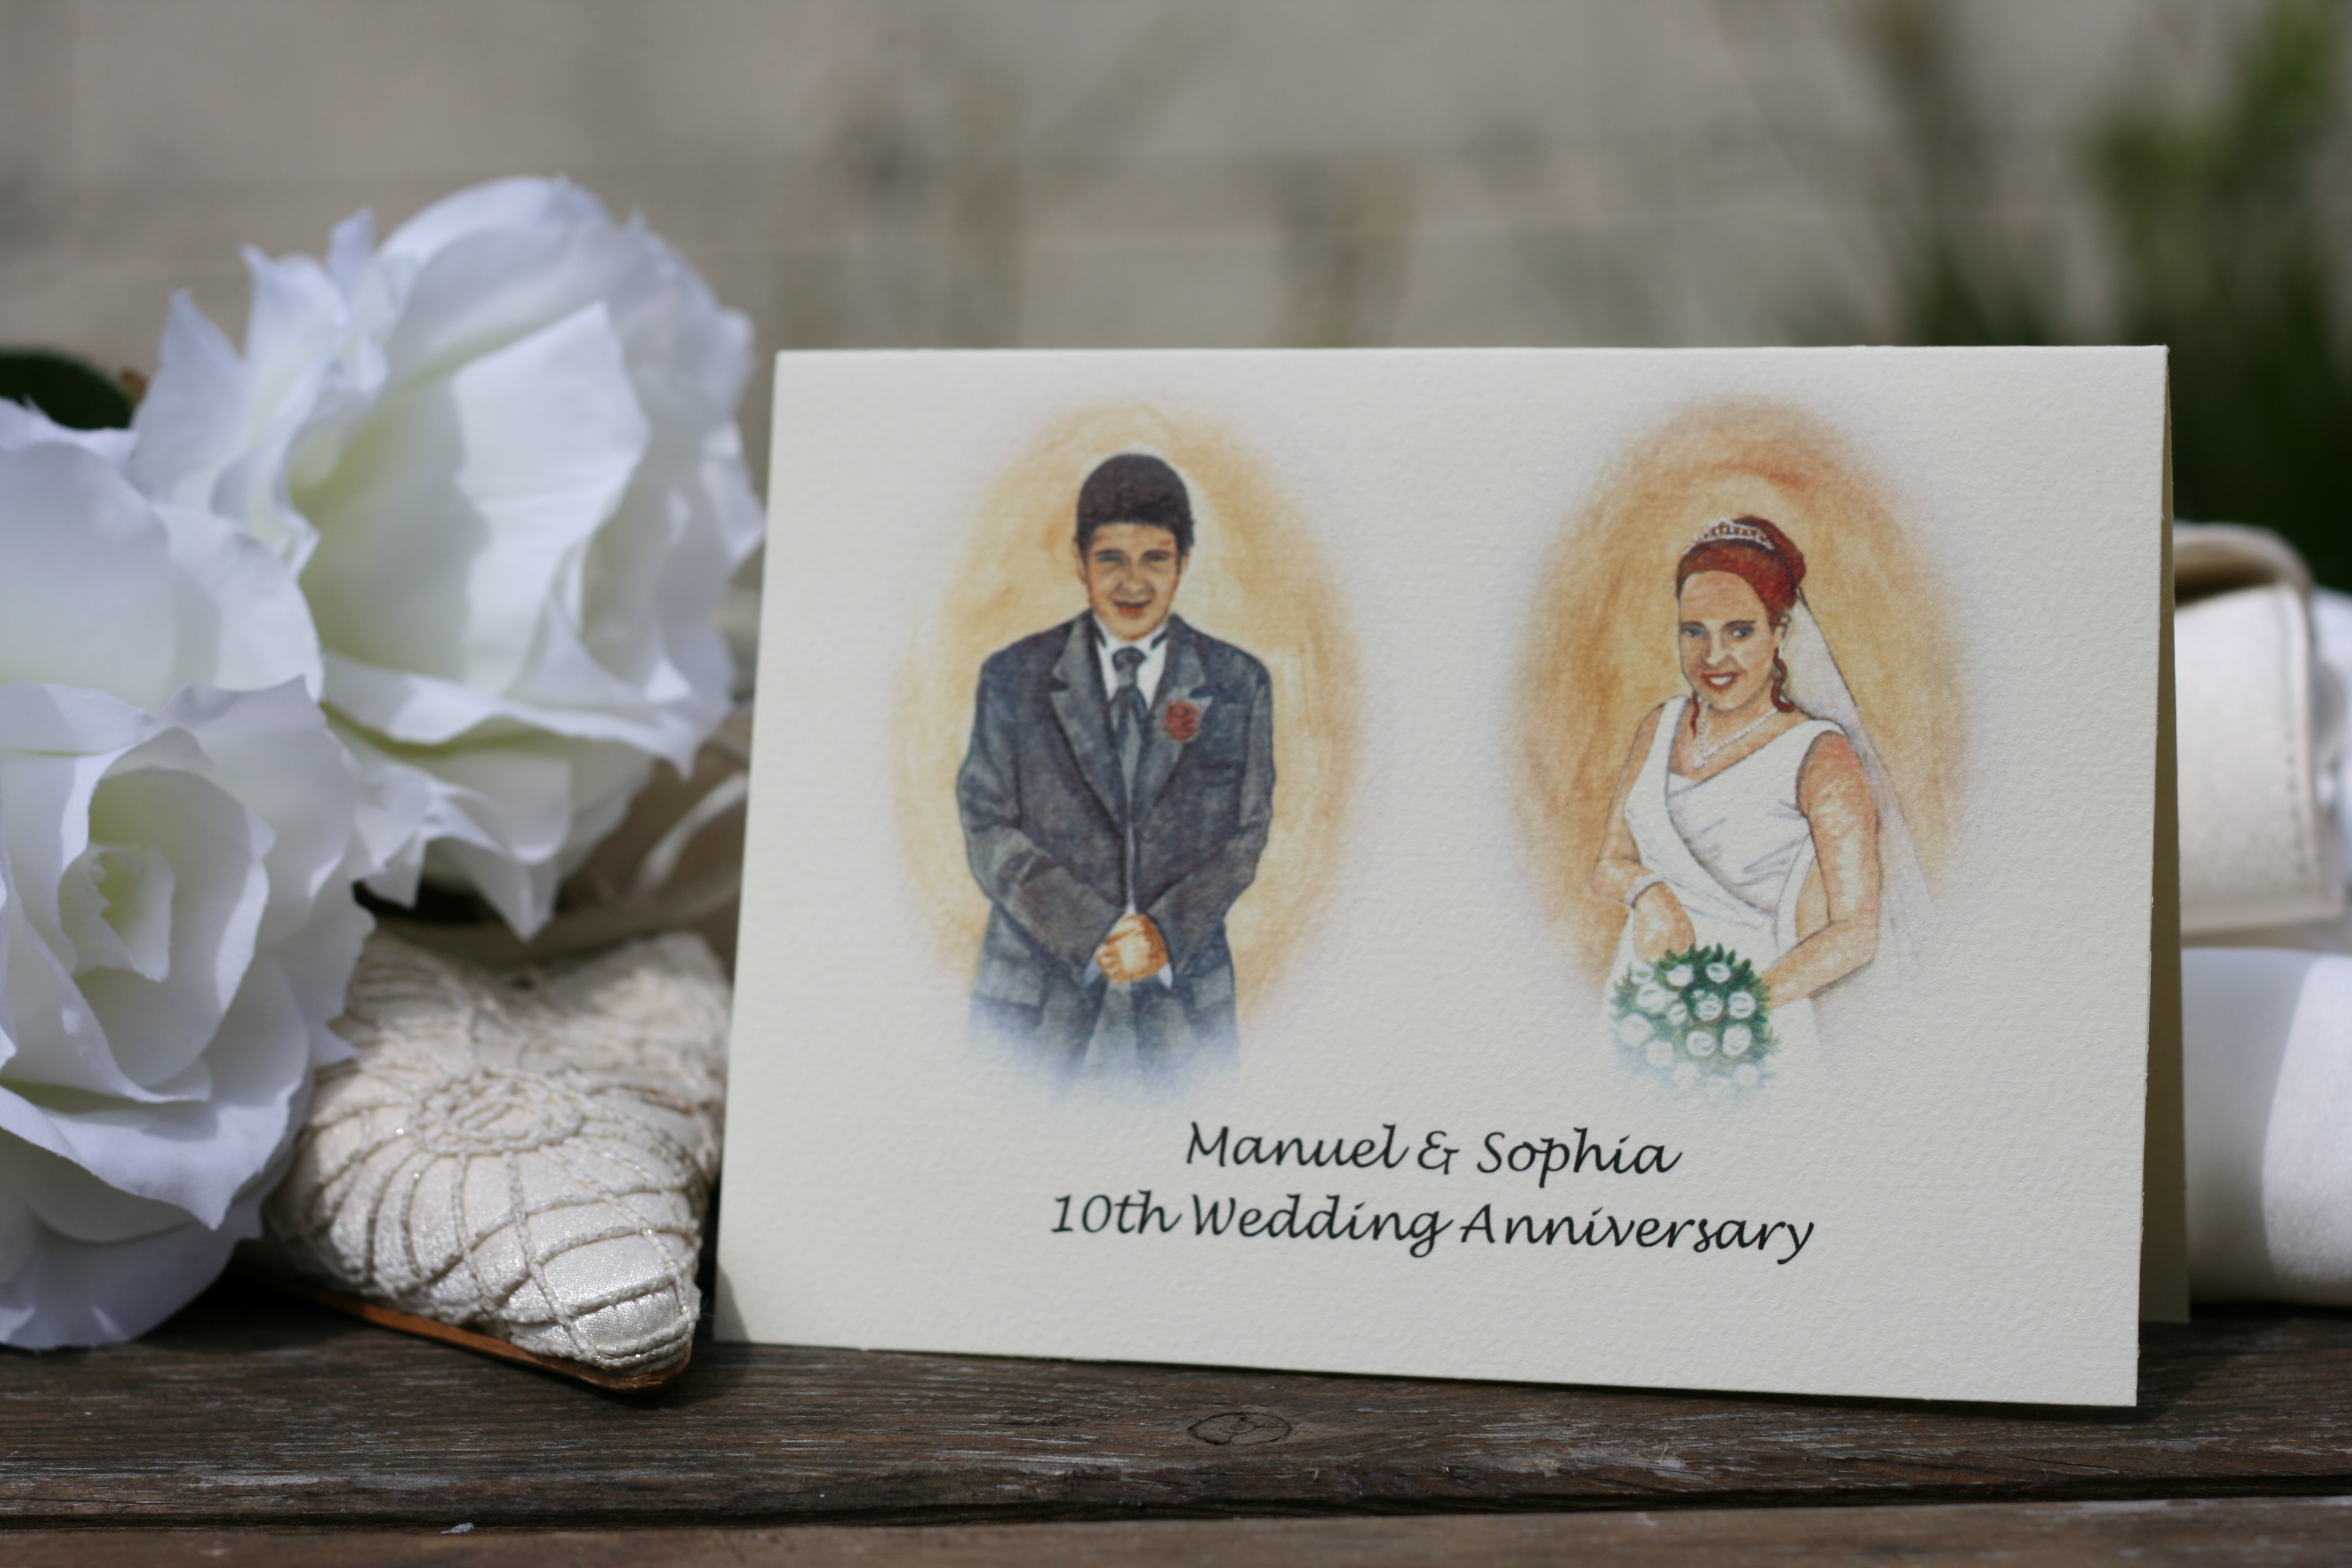 10th Wedding Anniversary Invitations